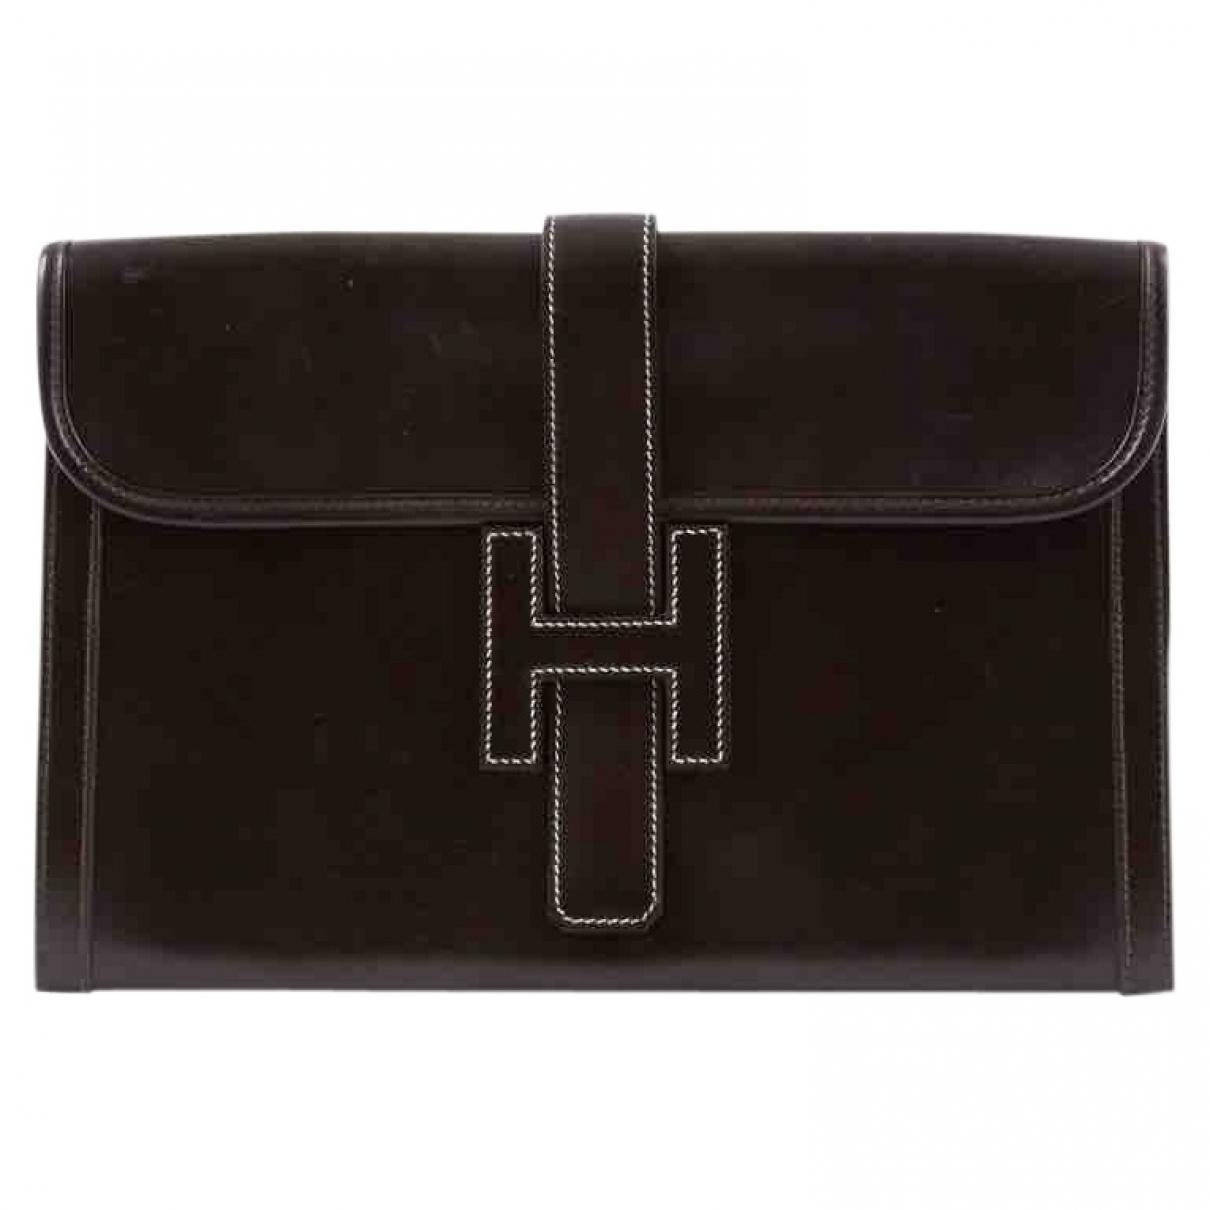 Hermès Jige Brown Leather Clutch bag for Women \N